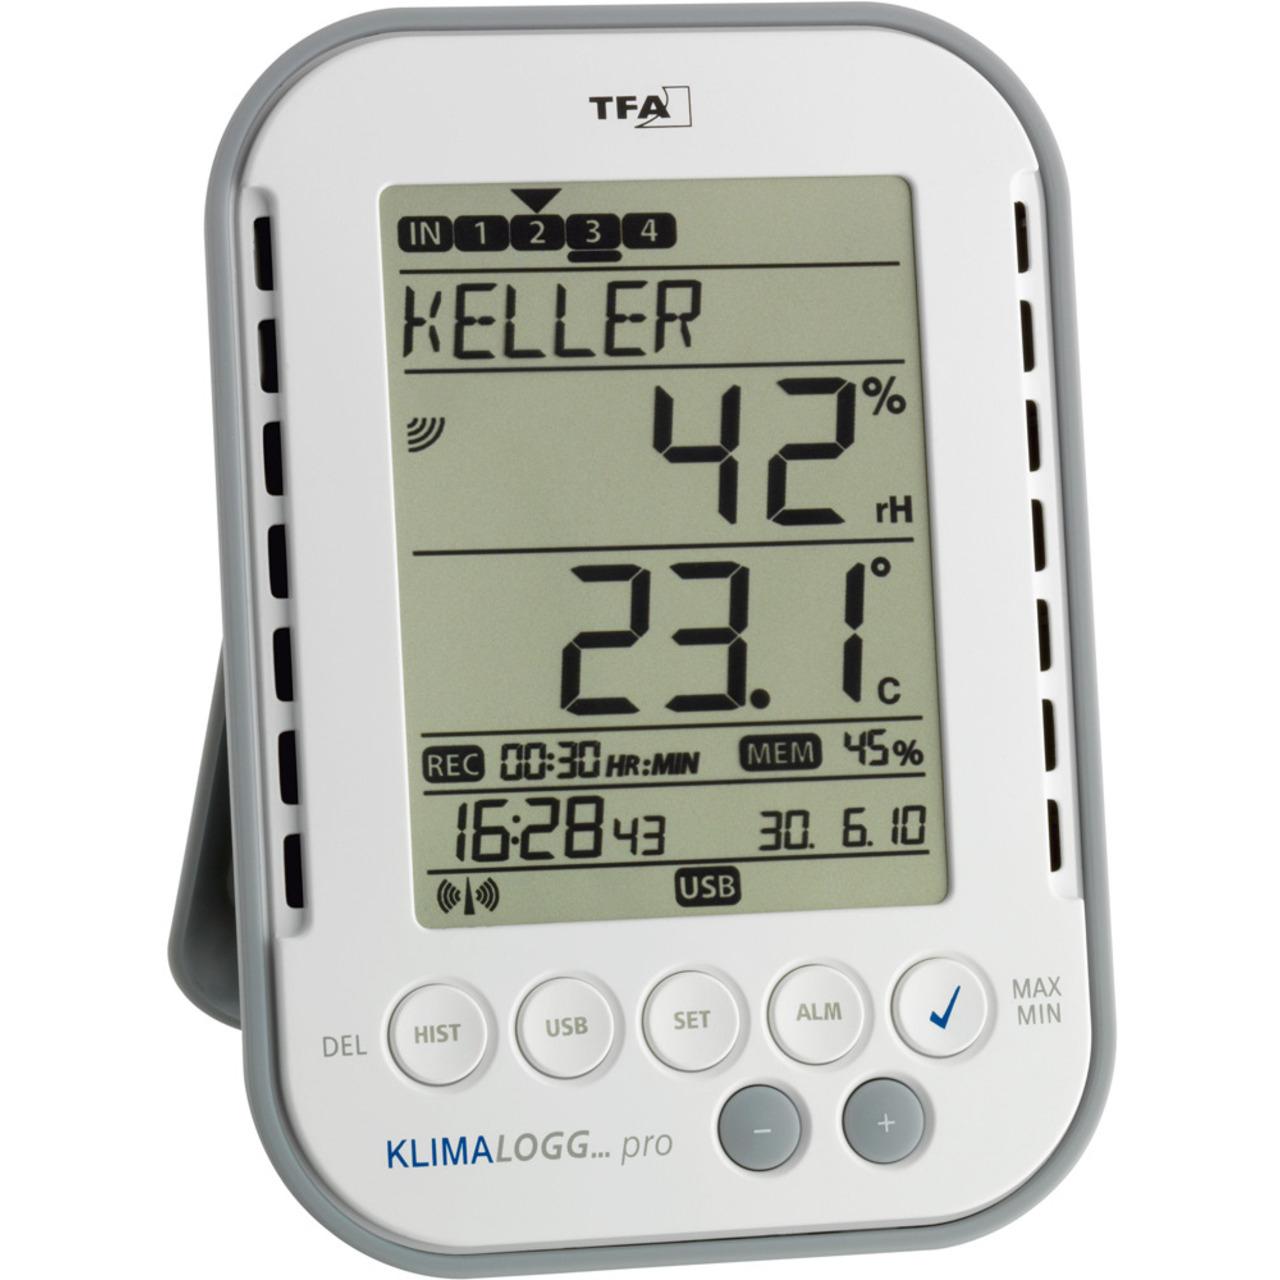 TFA Profi-Thermo-Hygrometer KlimaLogg Pro- mit Datenlogger-Funktion